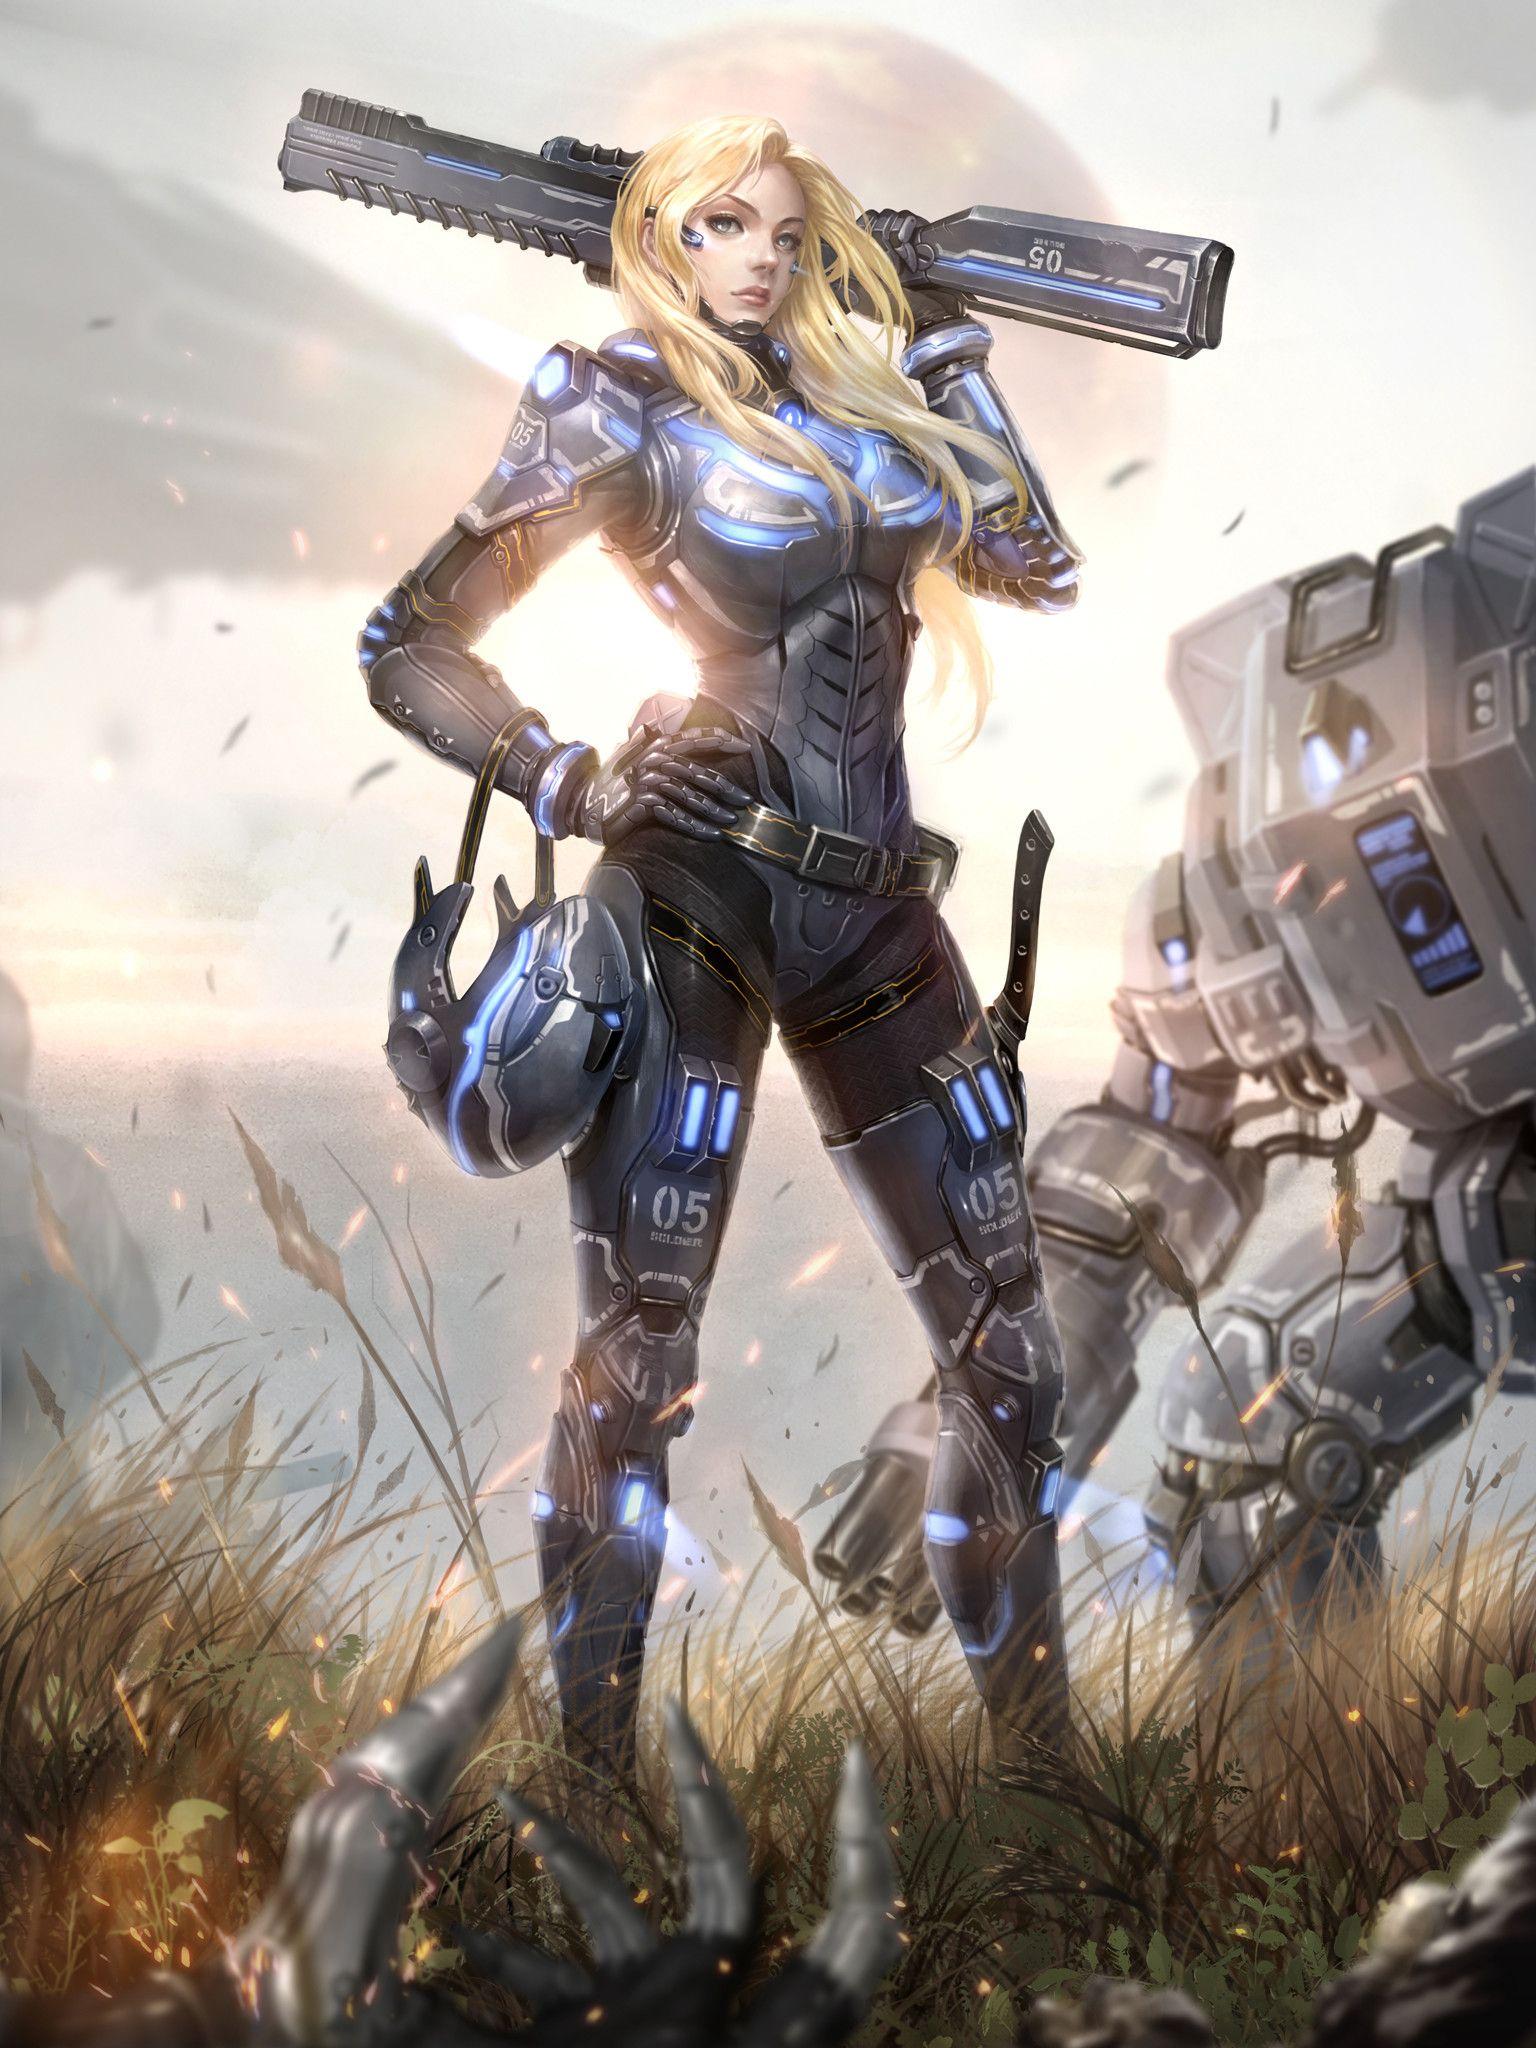 D-fantasy - captured female soldier